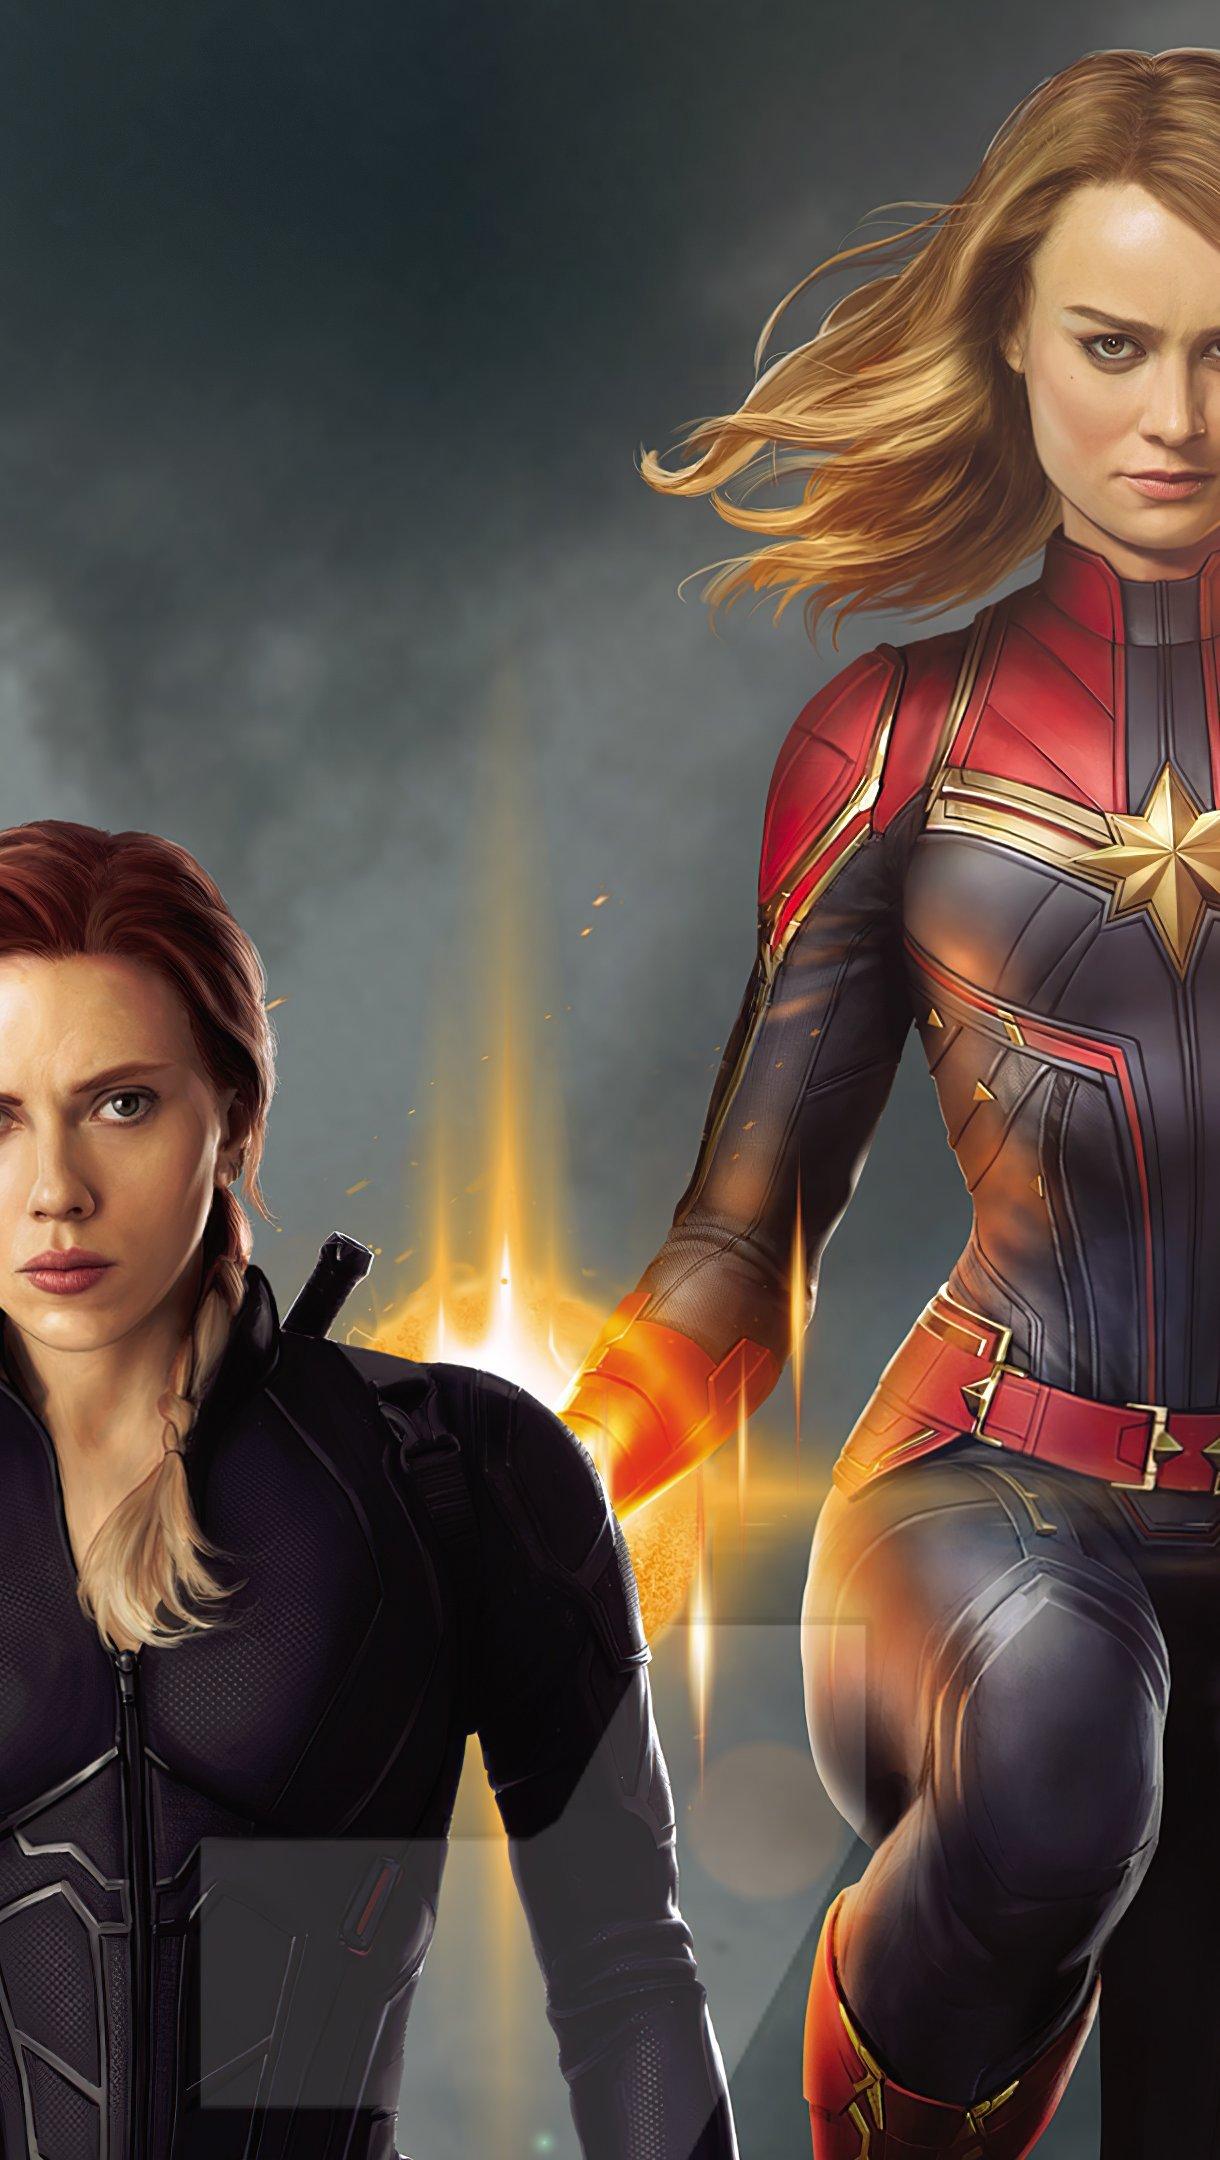 Wallpaper Captain Marvel and Black Widow Vertical